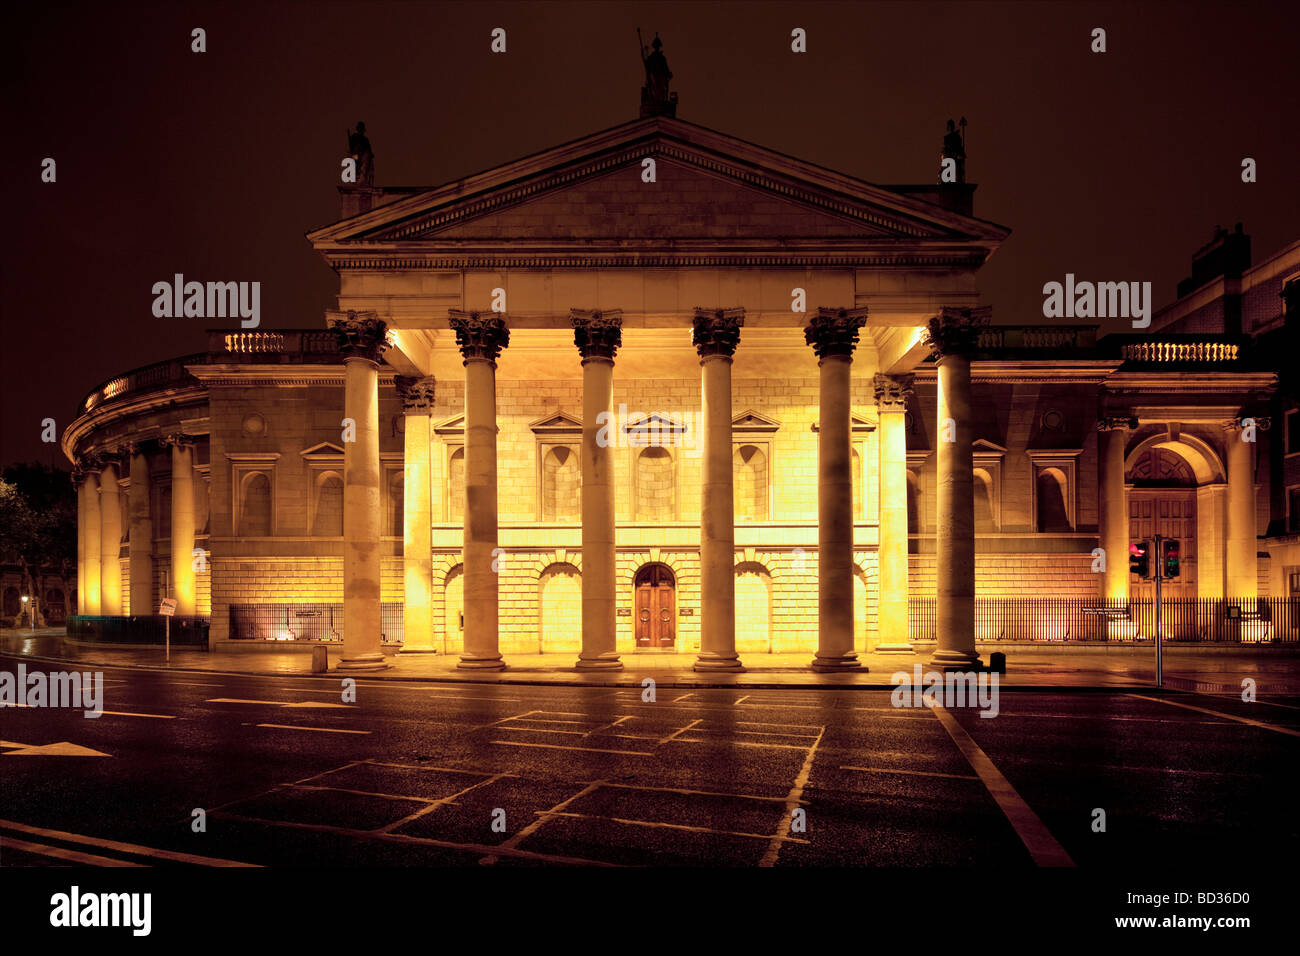 Bank of Ireland, College Green, Dublin, Ireland - Stock Image